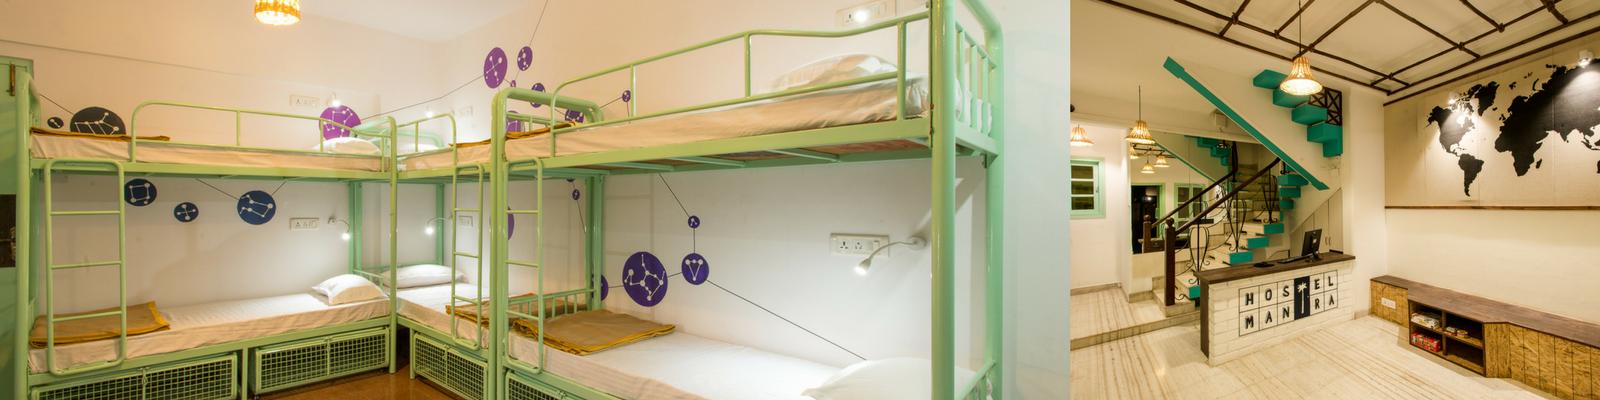 Hostel Mantra